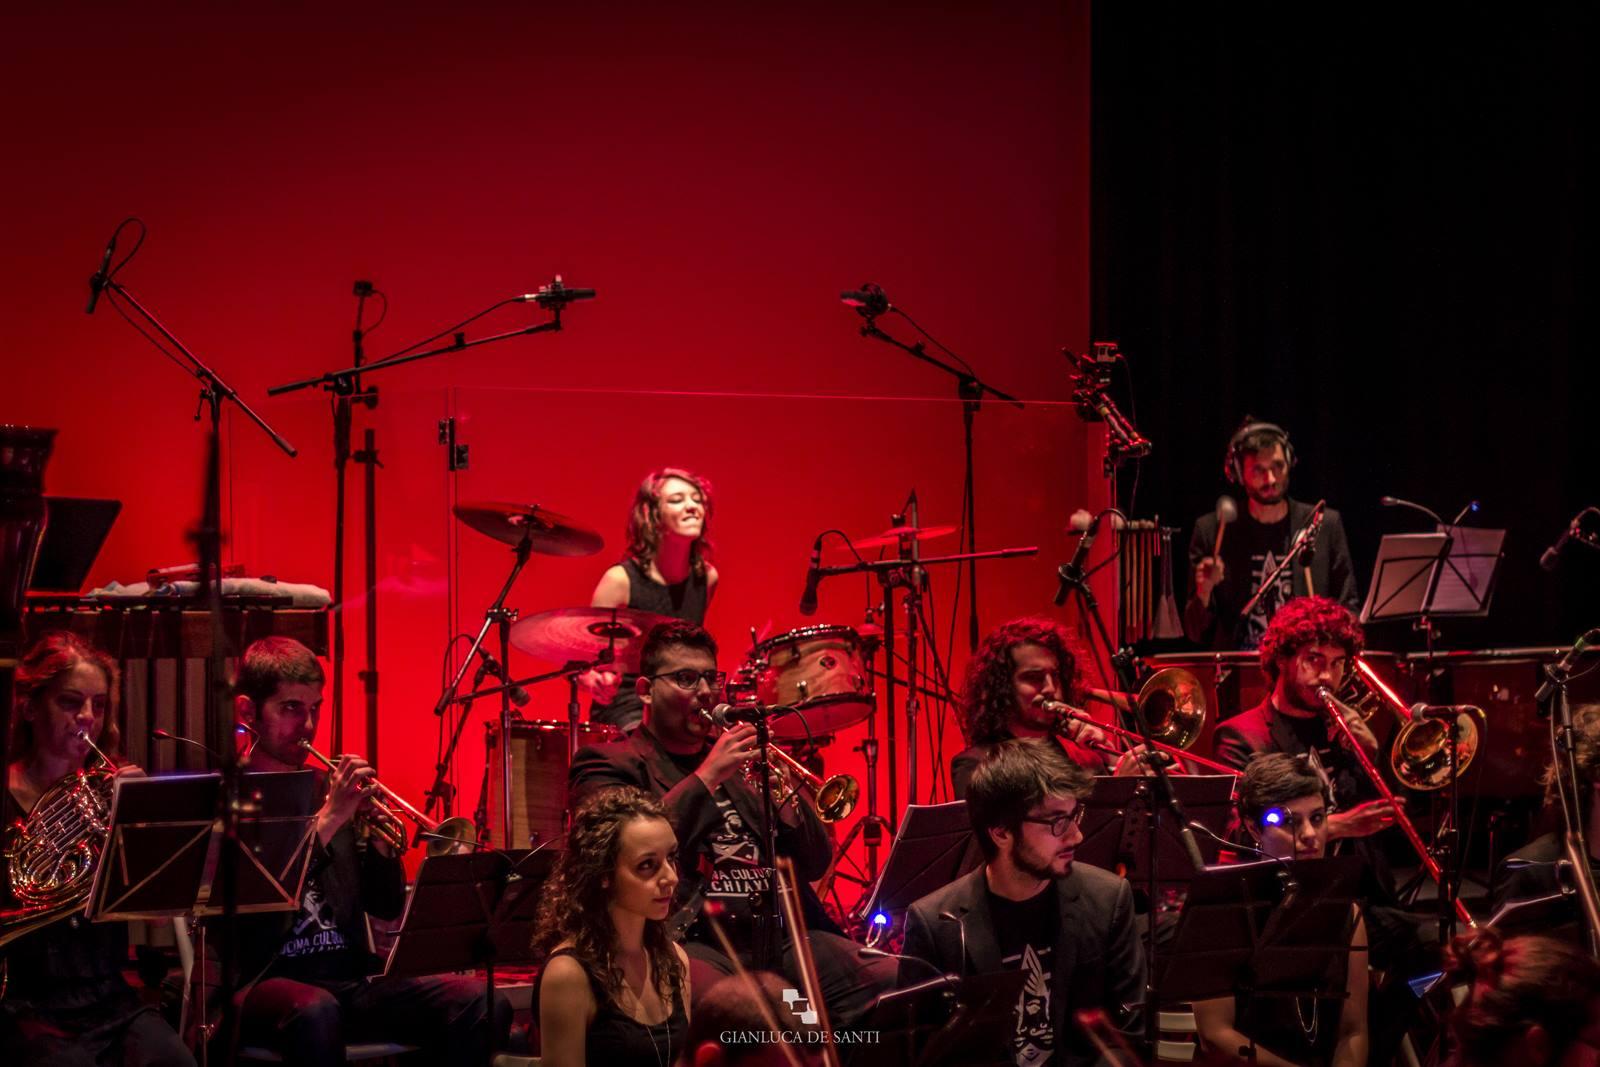 orchestra machiavelli - orchestra of doom